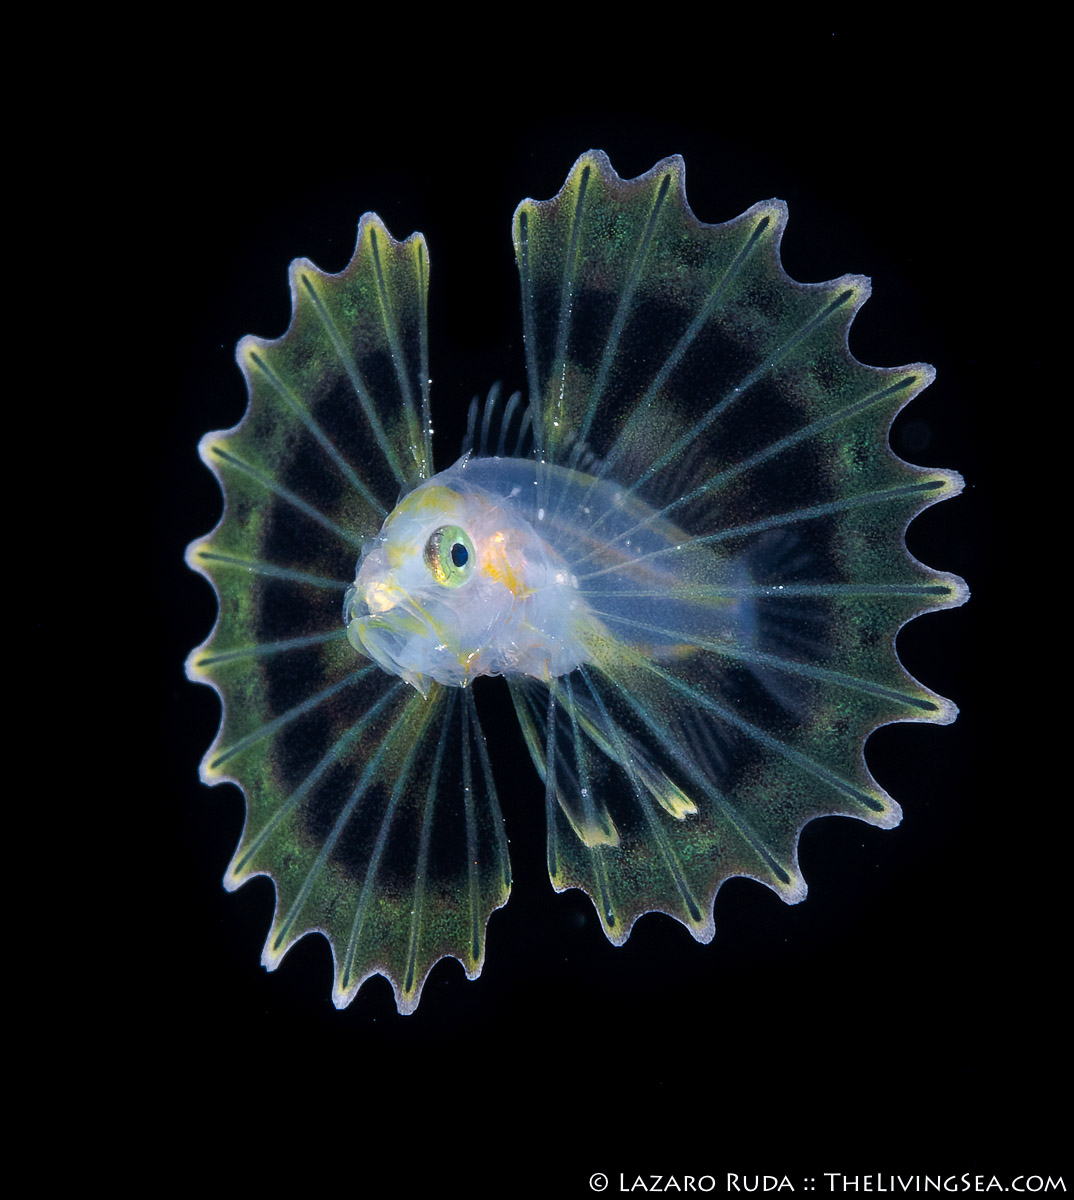 Bony Fishes: Osteichthyes, Fishes, LIFE STAGES, less than 1 inch, Laz Ruda, Lazaro Ruda Wildlife Photographer, Lionfishes: Scorpaenidae, MARINE LIFE, PHOTO TYPE, night dive, SIZE, macro, TheLivingSea.com, West Palm Beach, [LOCATION], blackwater, larvae, macro, marine, ocean, underwater, underwater photo